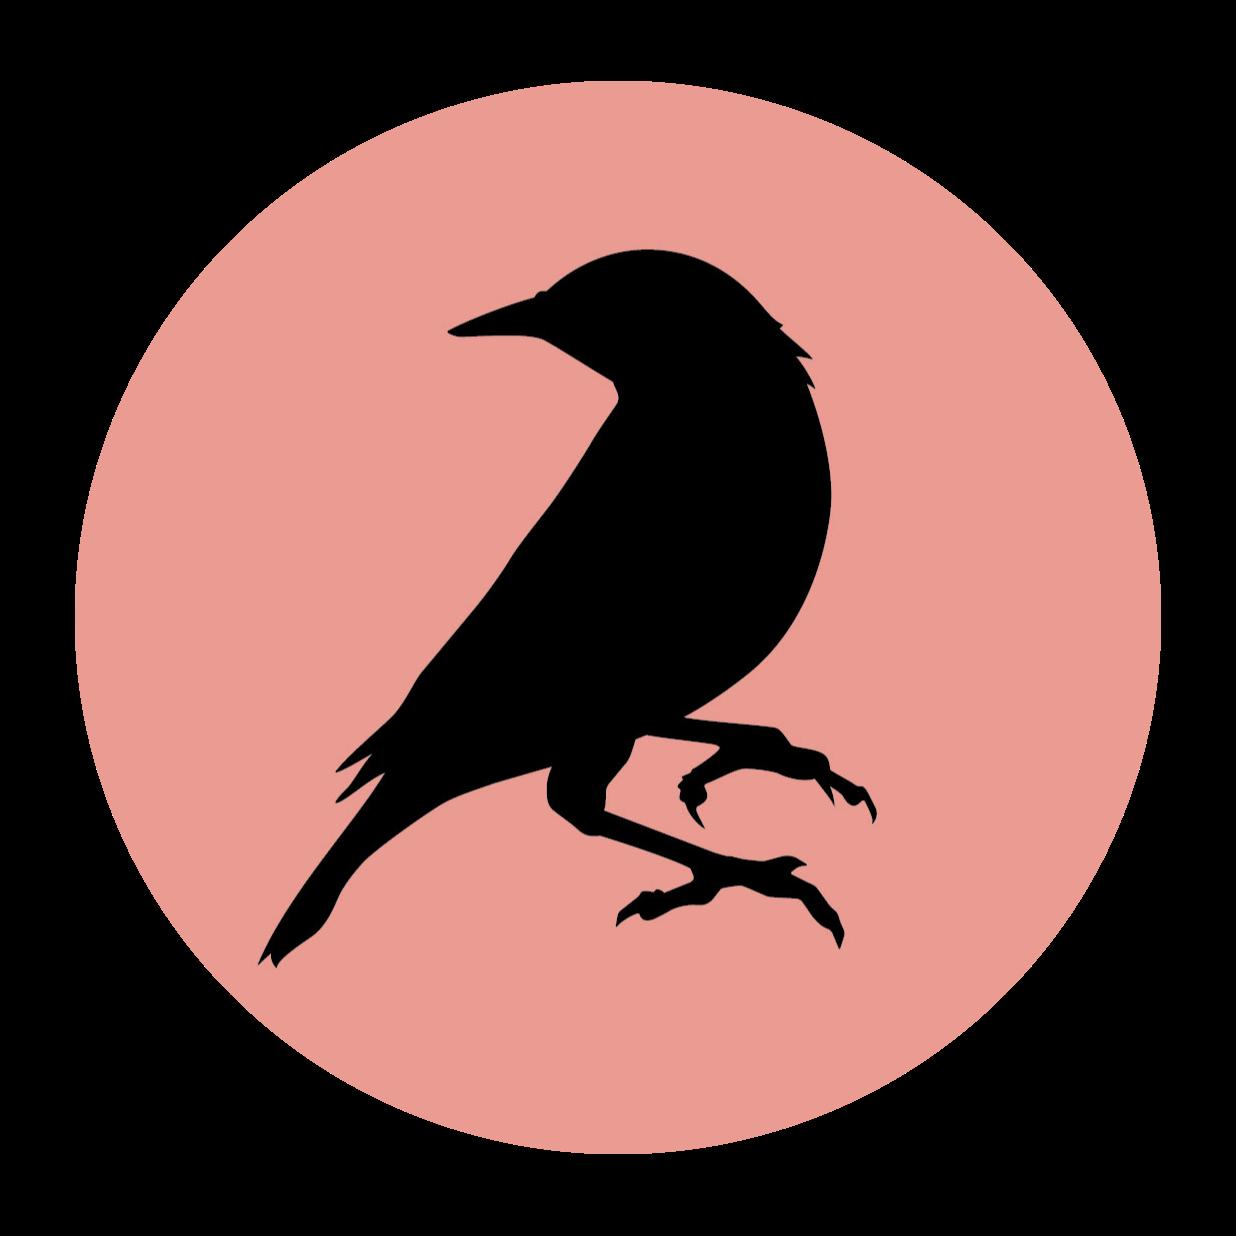 @blackbirddoughnuts Profile Image | Linktree